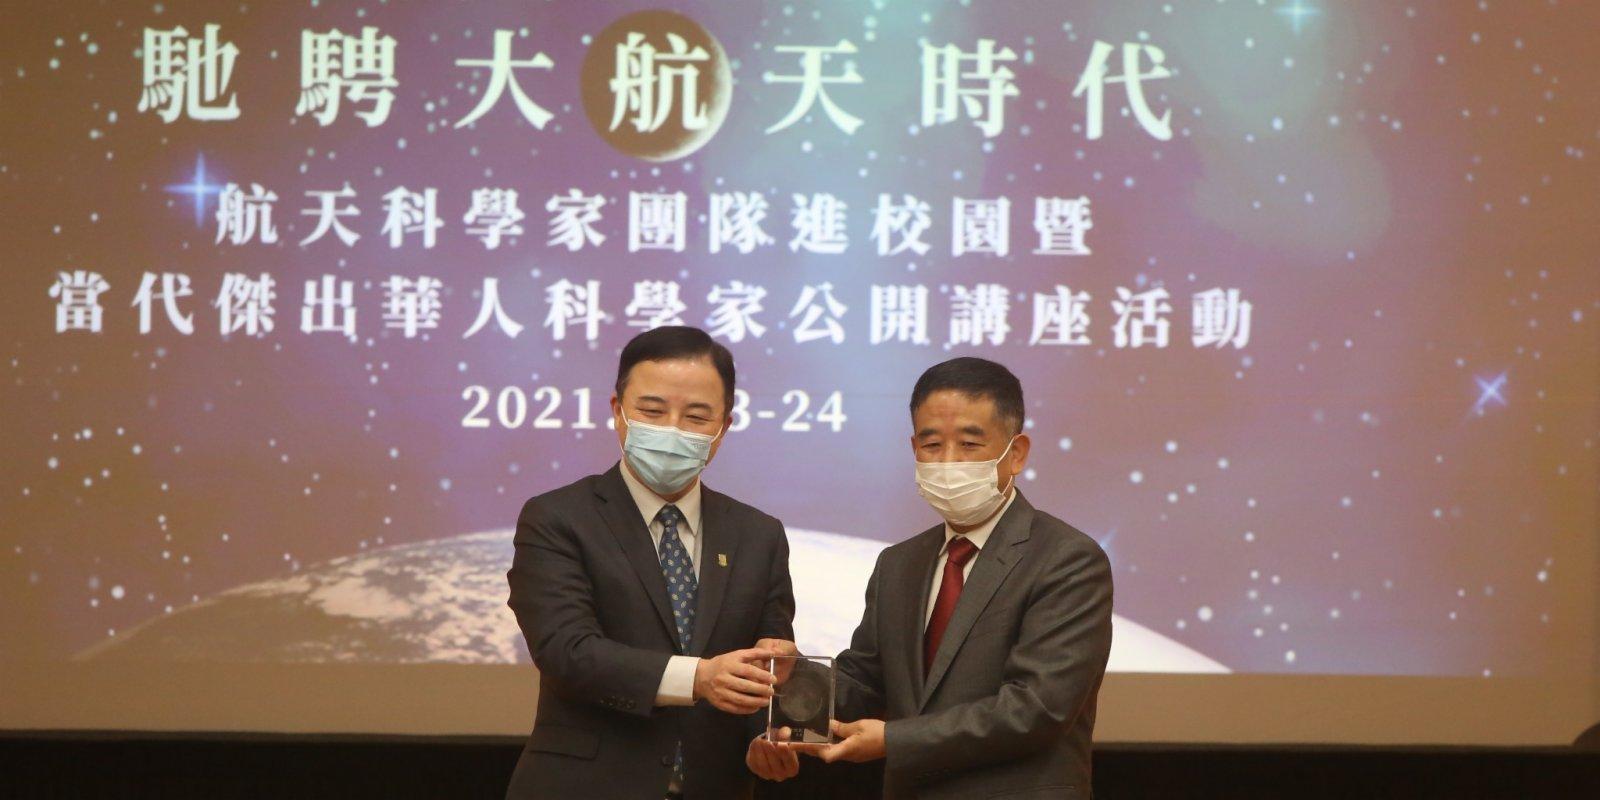 China's lunar exploration expert shares experience at HKU